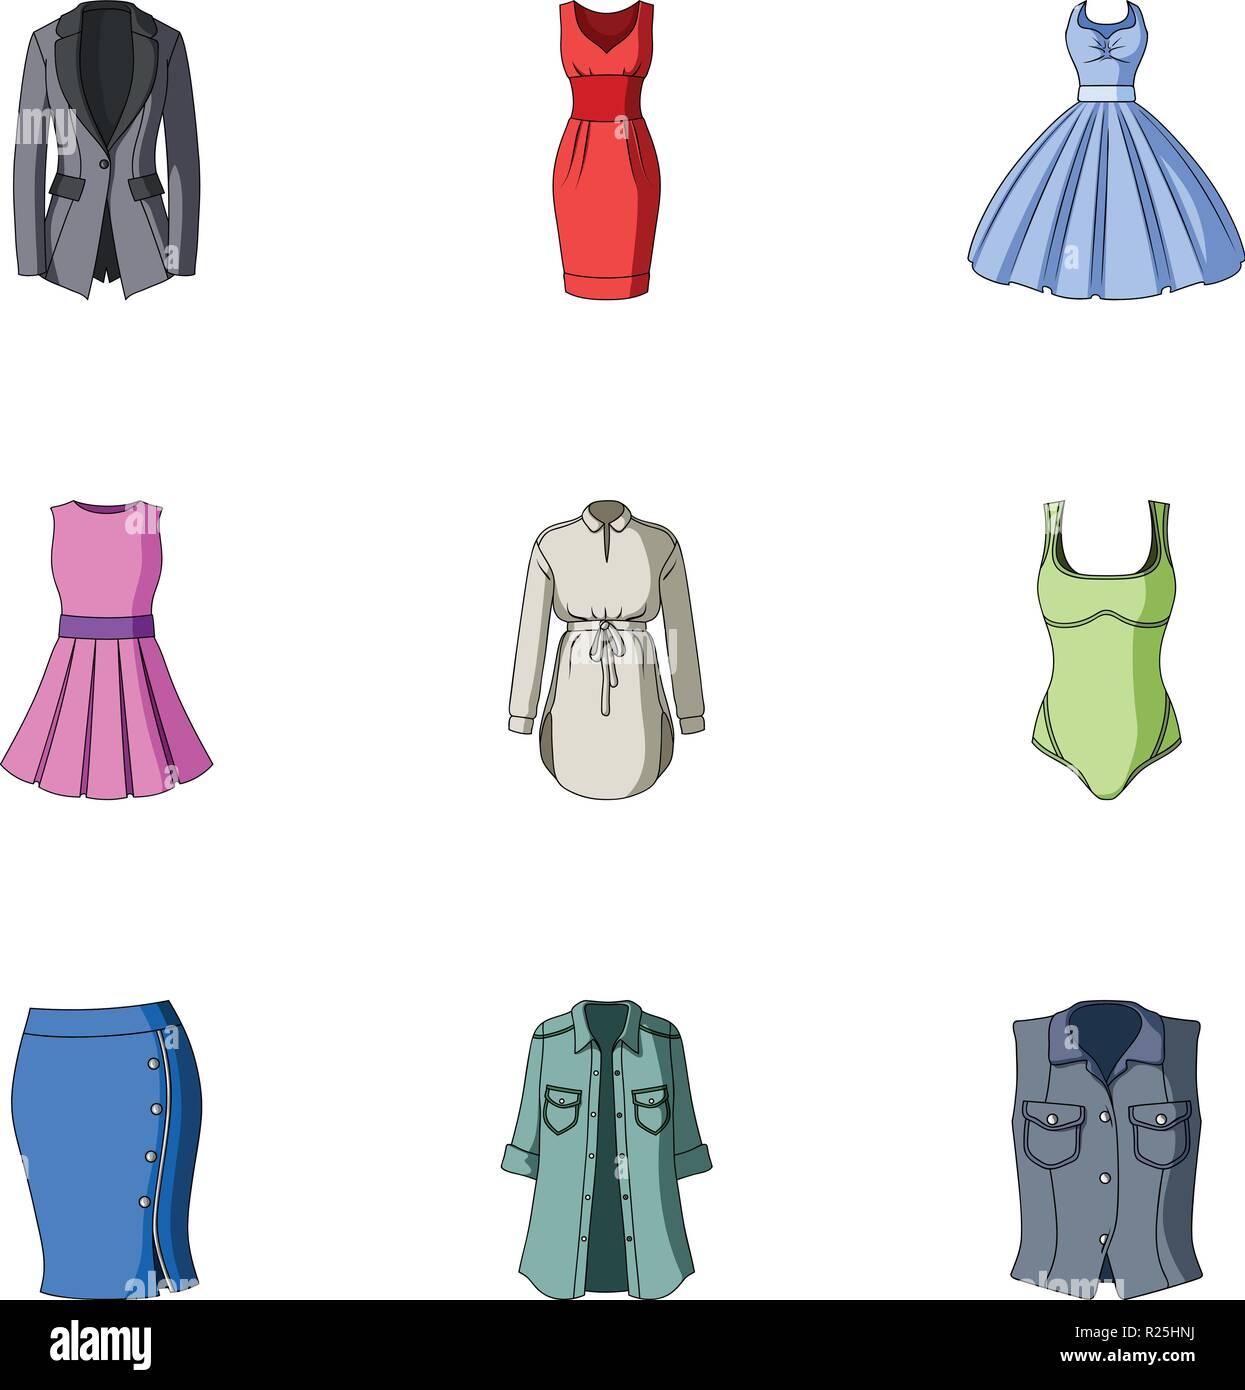 9cd0b407e Colección de iconos de ropa de mujer. Diversas prendas de vestir de ...